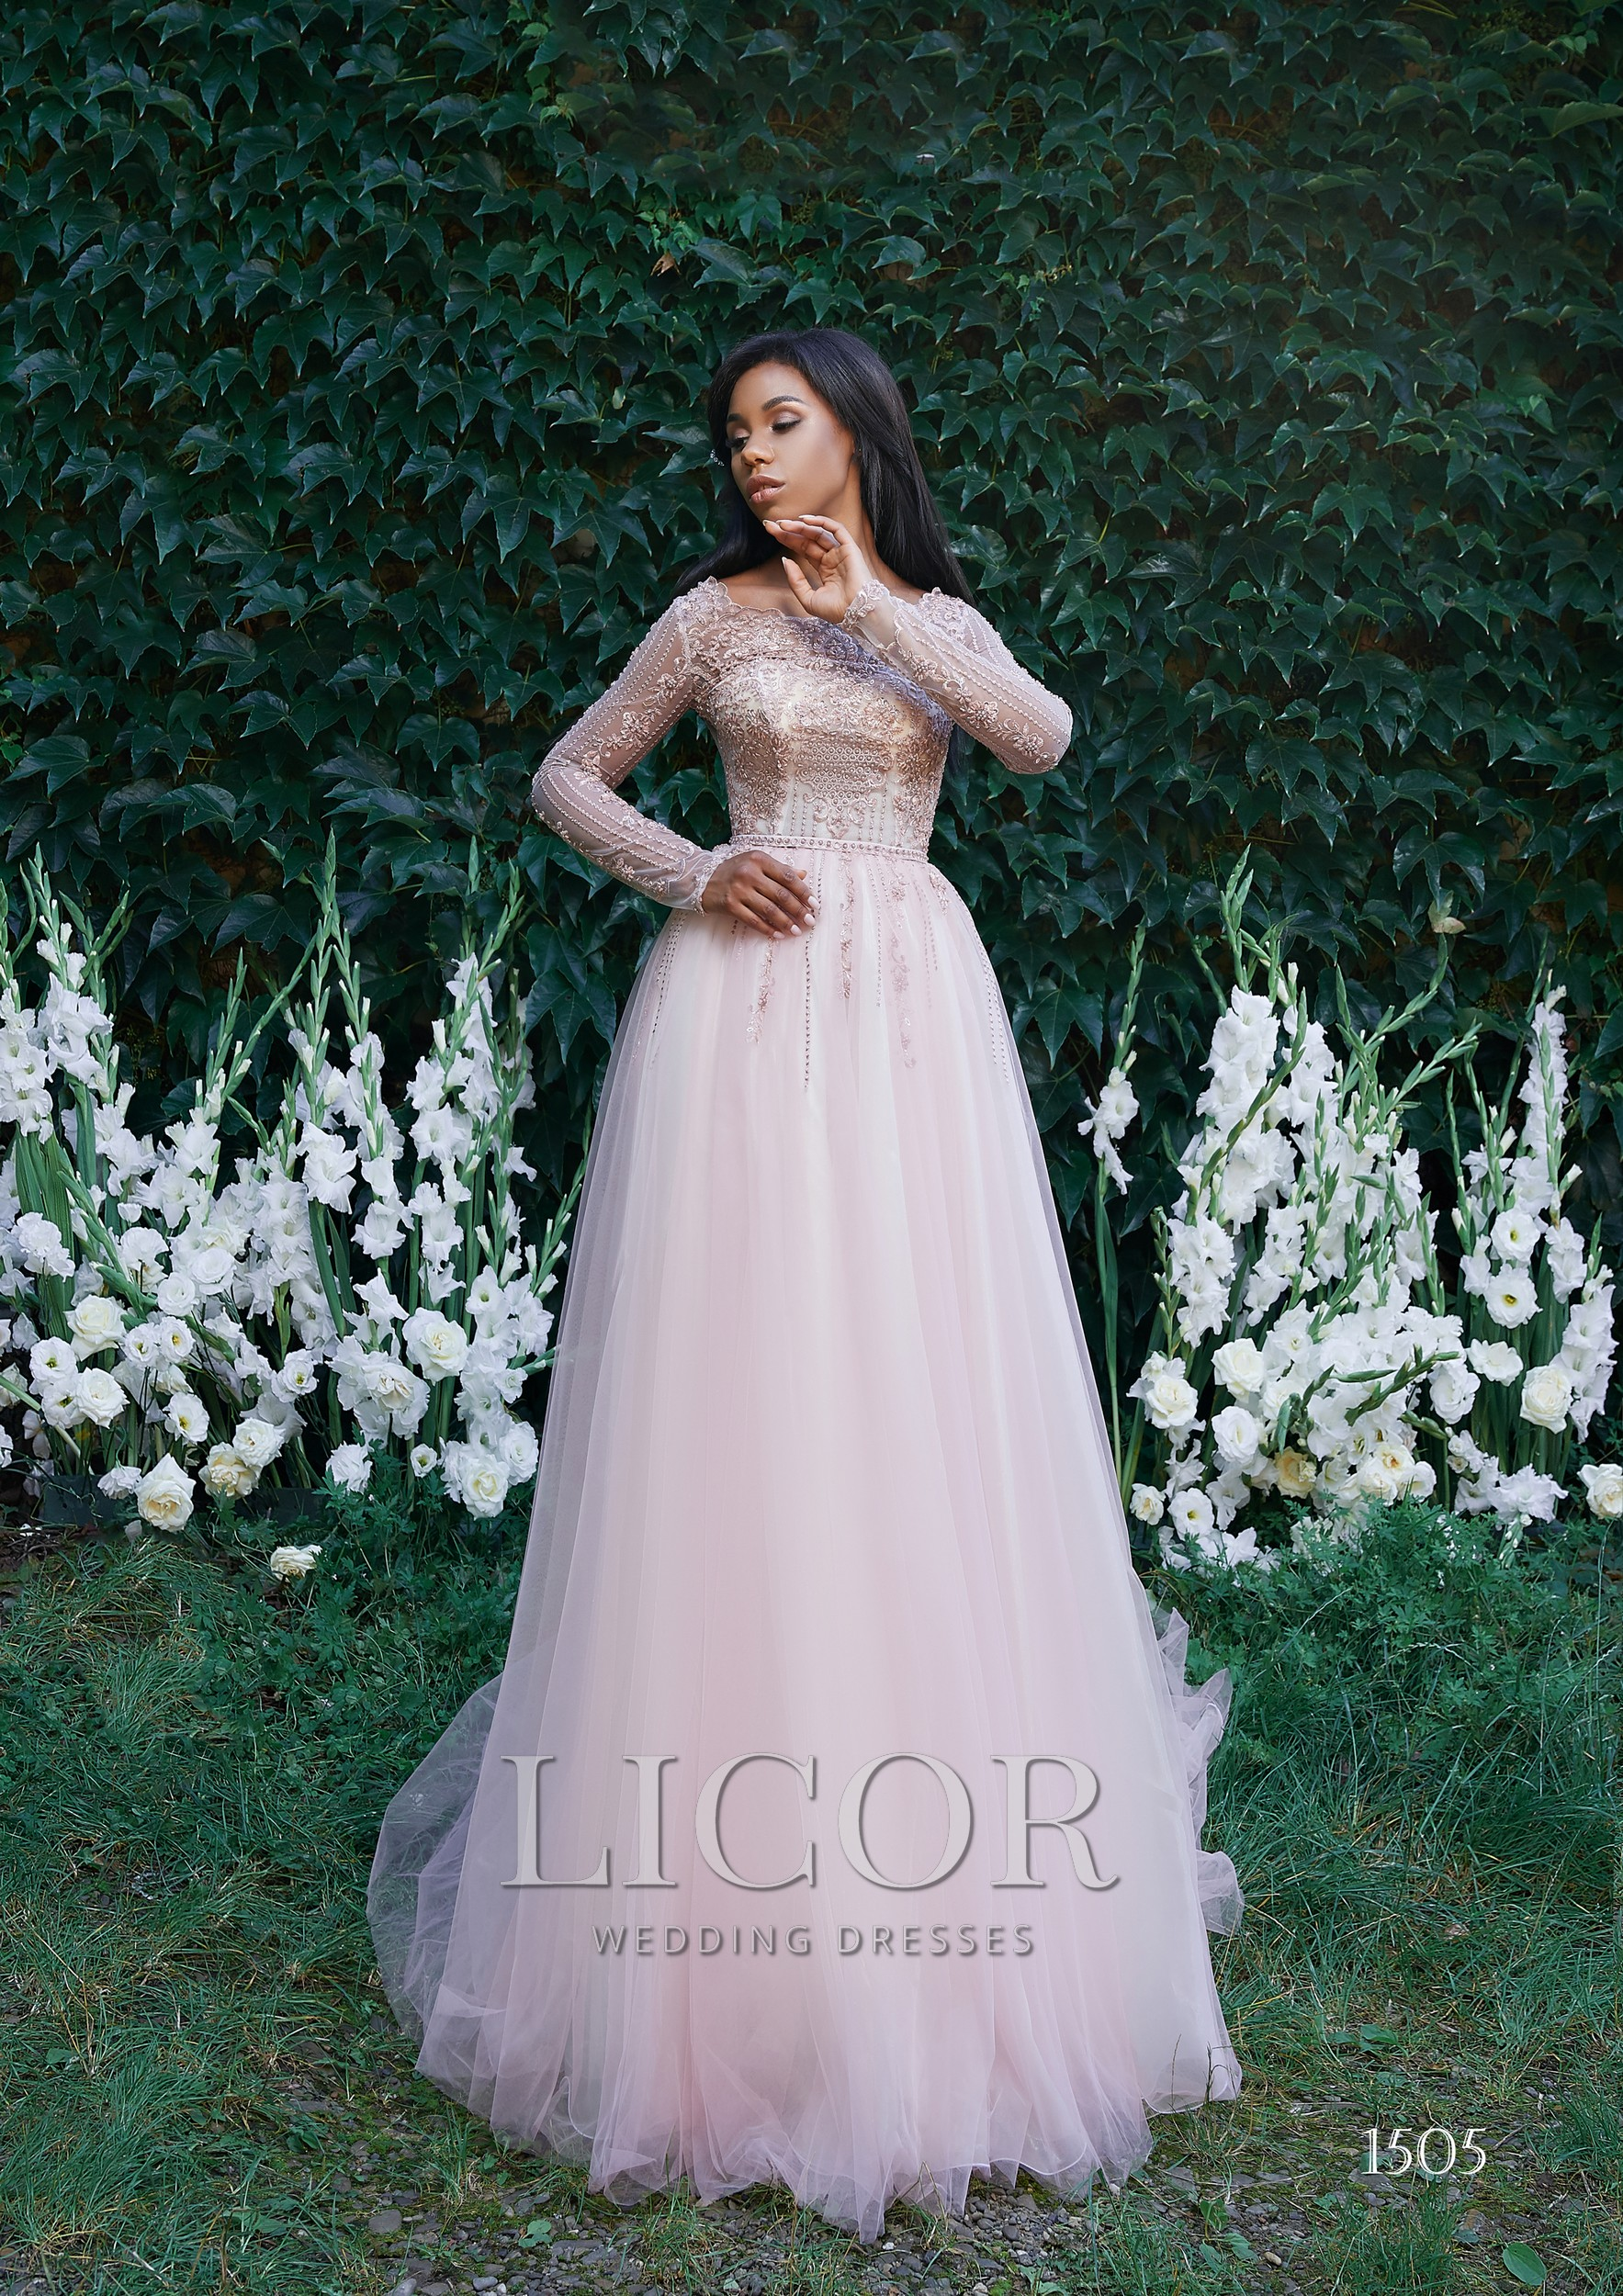 https://licor.com.ua/images/stories/virtuemart/product/1505-1.jpg